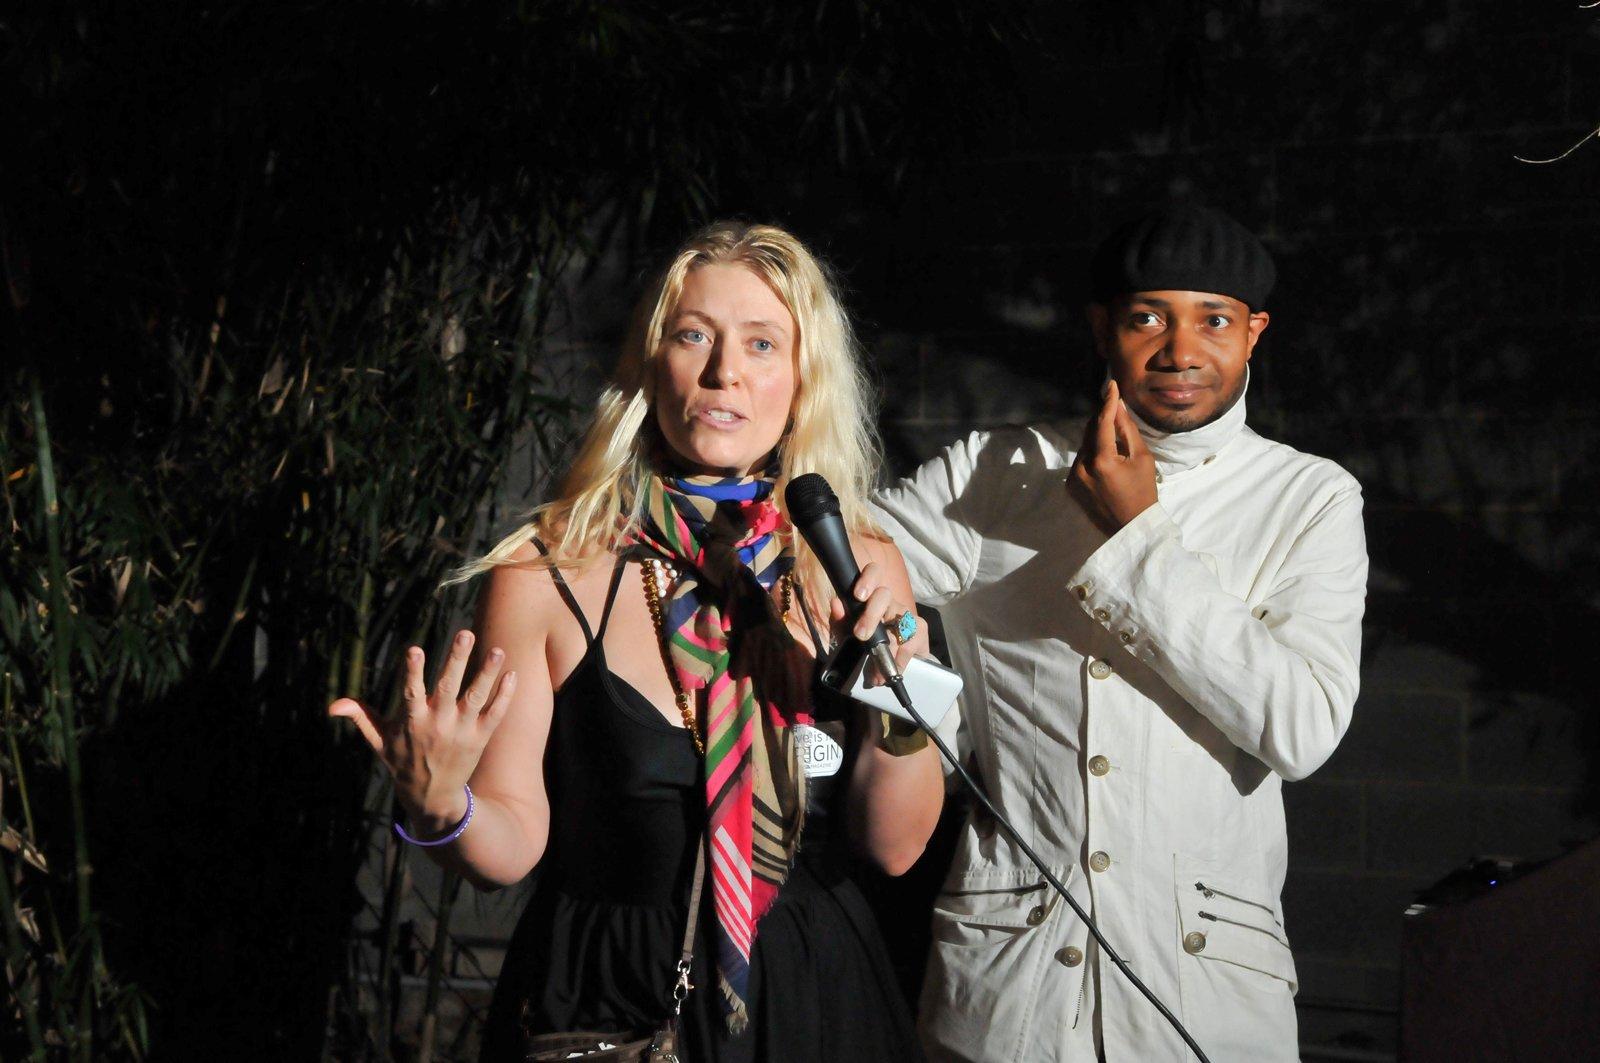 Maranda Pleasant, publisher of Origin Magazine, introduces the award-winning DJ Spooky (Paul Miller).  Photo 18 of 20 in Dwell Party Highlights: Celebrating Prefab Design at SXSW Eco